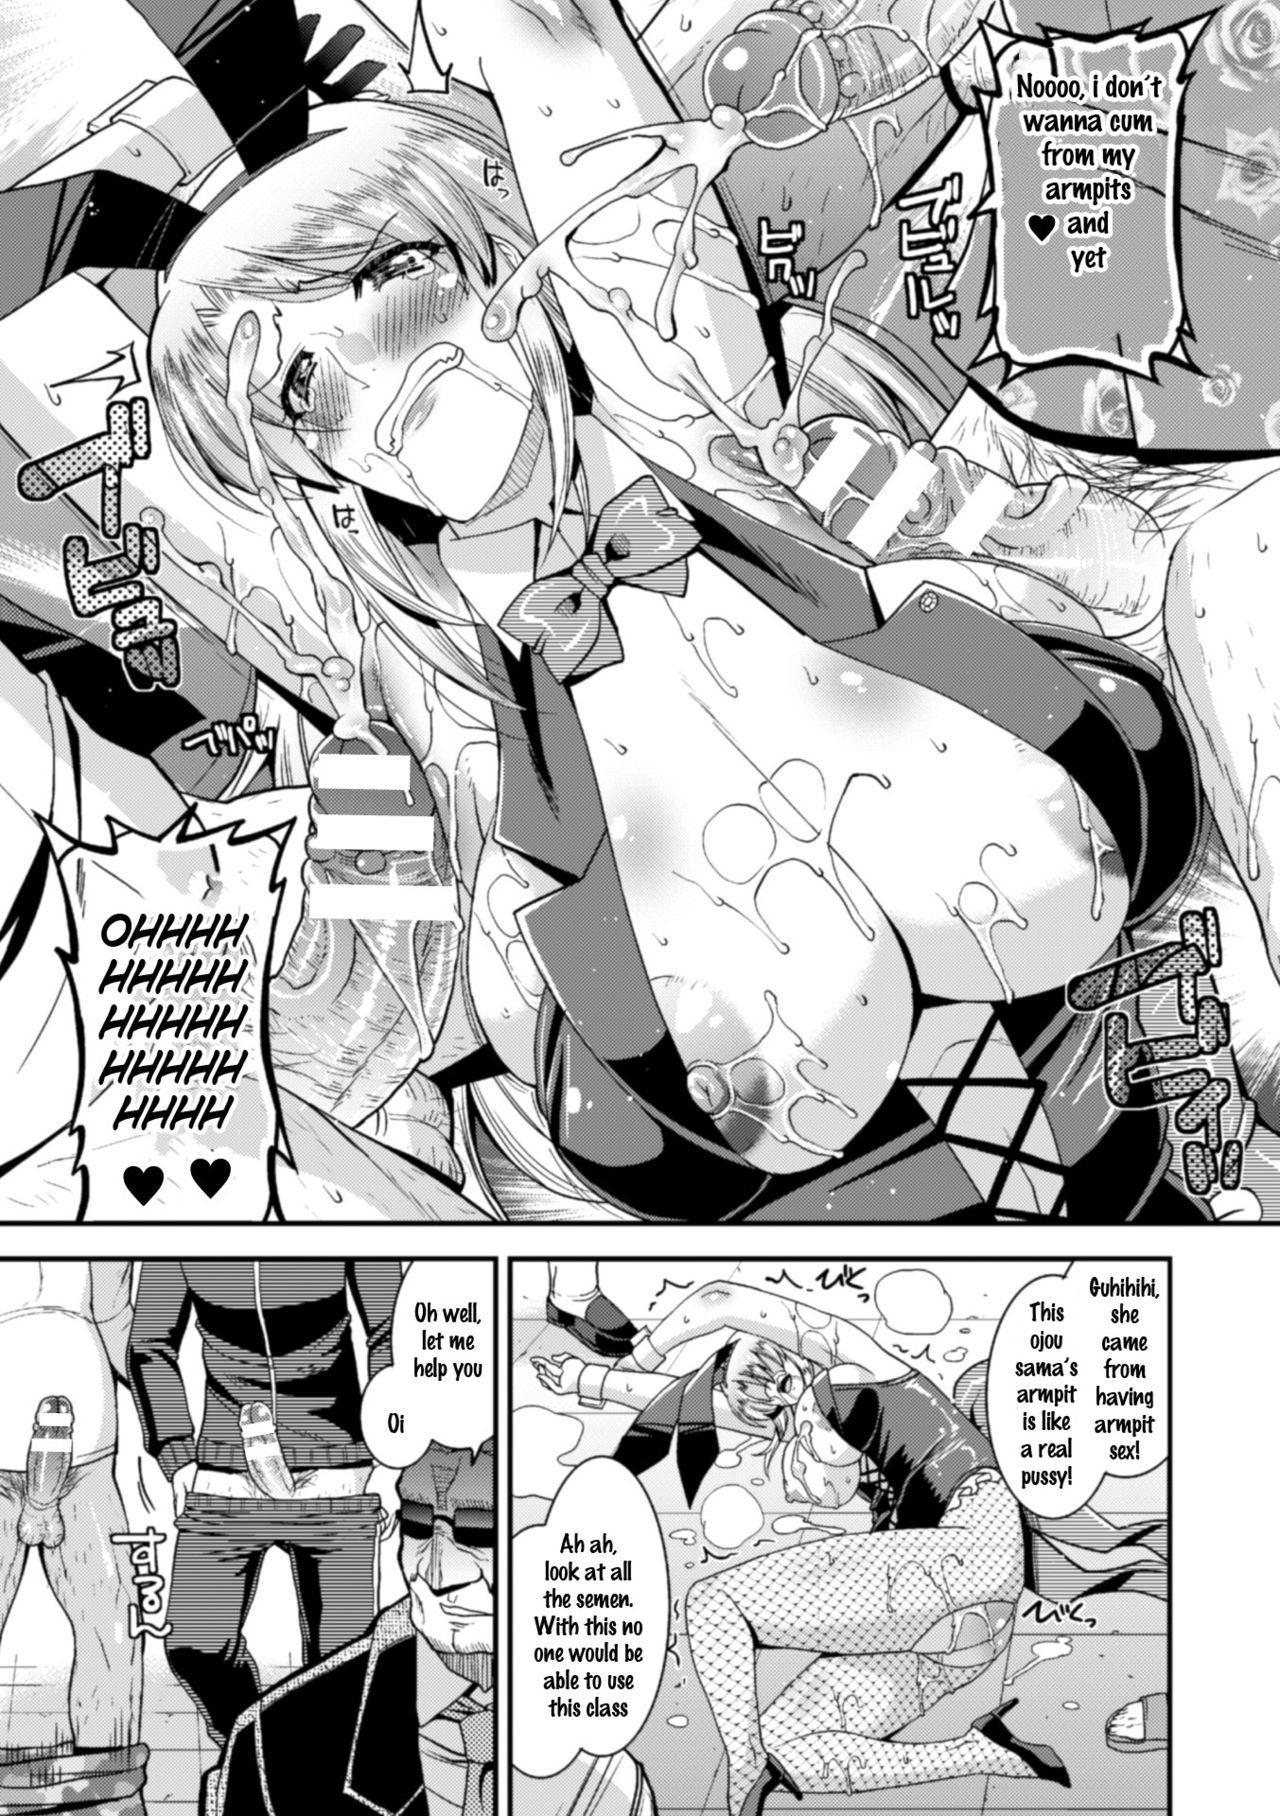 2D Comic Magazine Waki Fechi Bunny Girl Vol.1 Ch 1-3 60